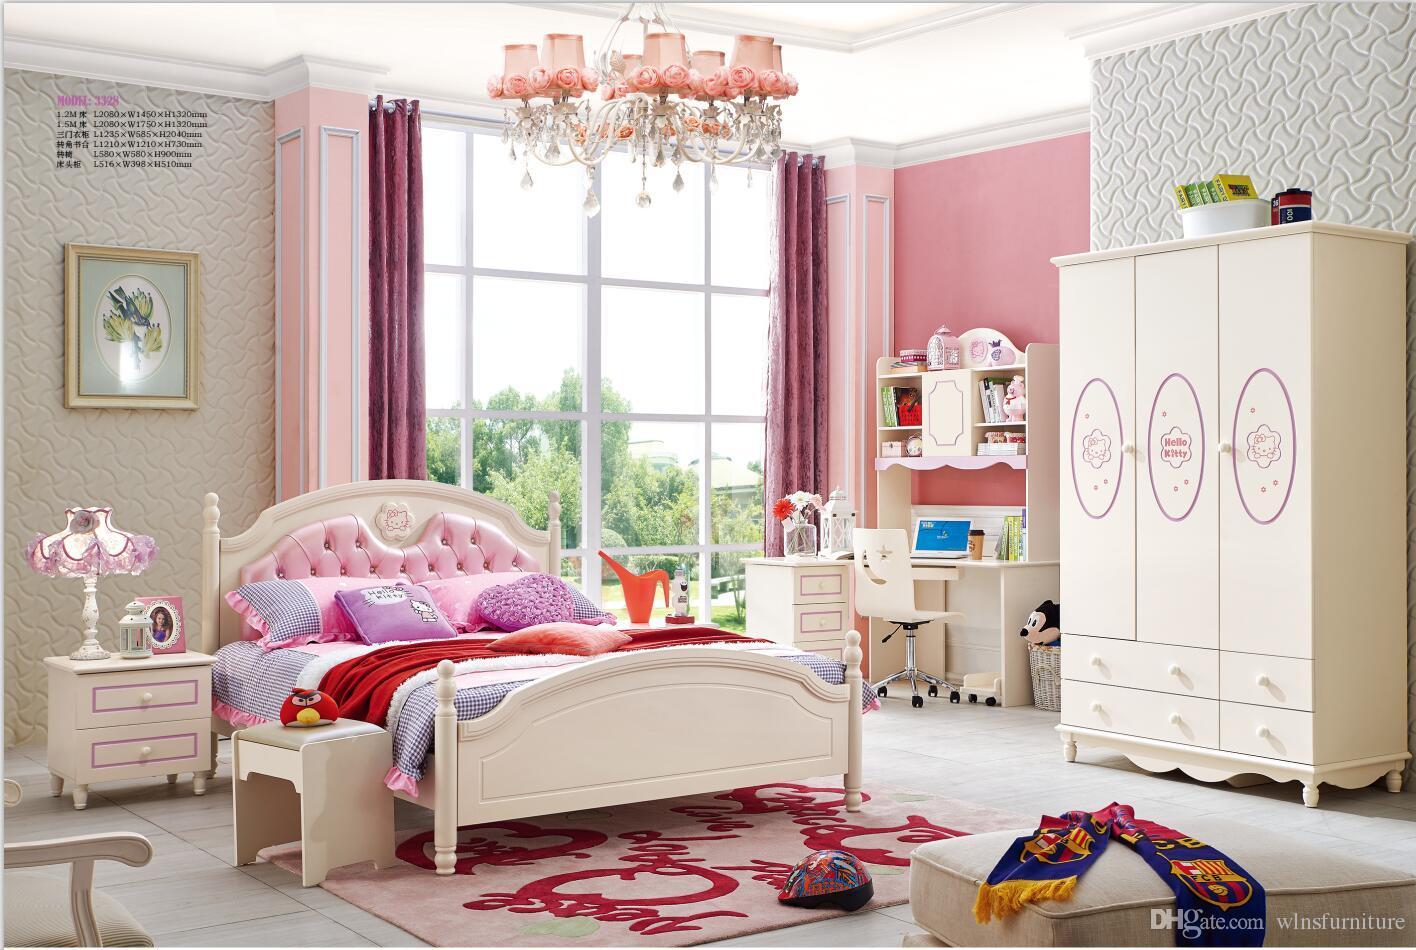 2019 Ash Solid Wood Children Bedroom Furniture Set Health Environmentally  Friendly Children Bed Wardrobe Desk Bedside Table From Wlnsfurniture, ...